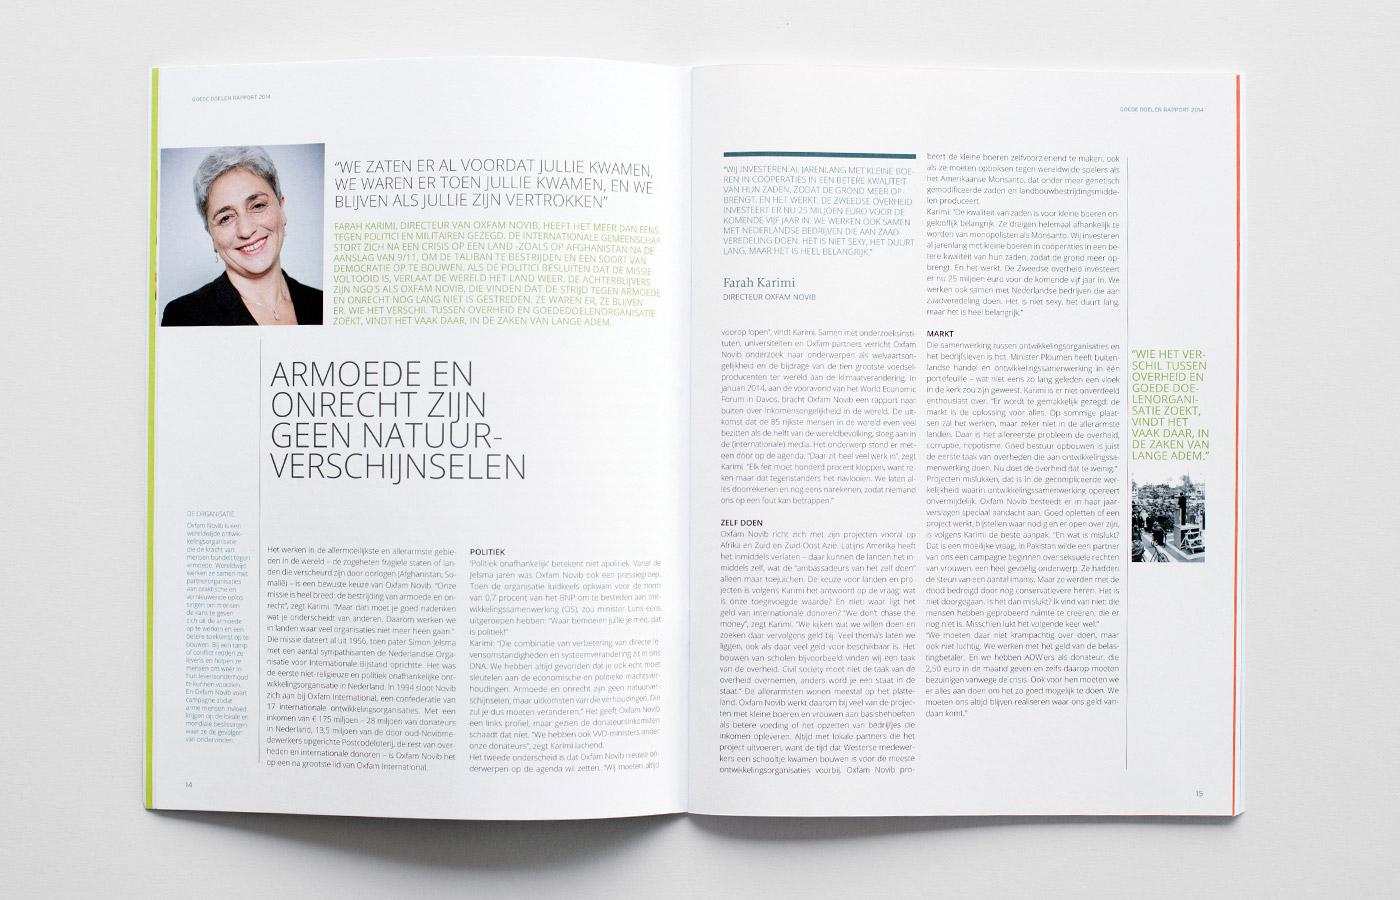 spread 2 rapport goede doelen Nederland